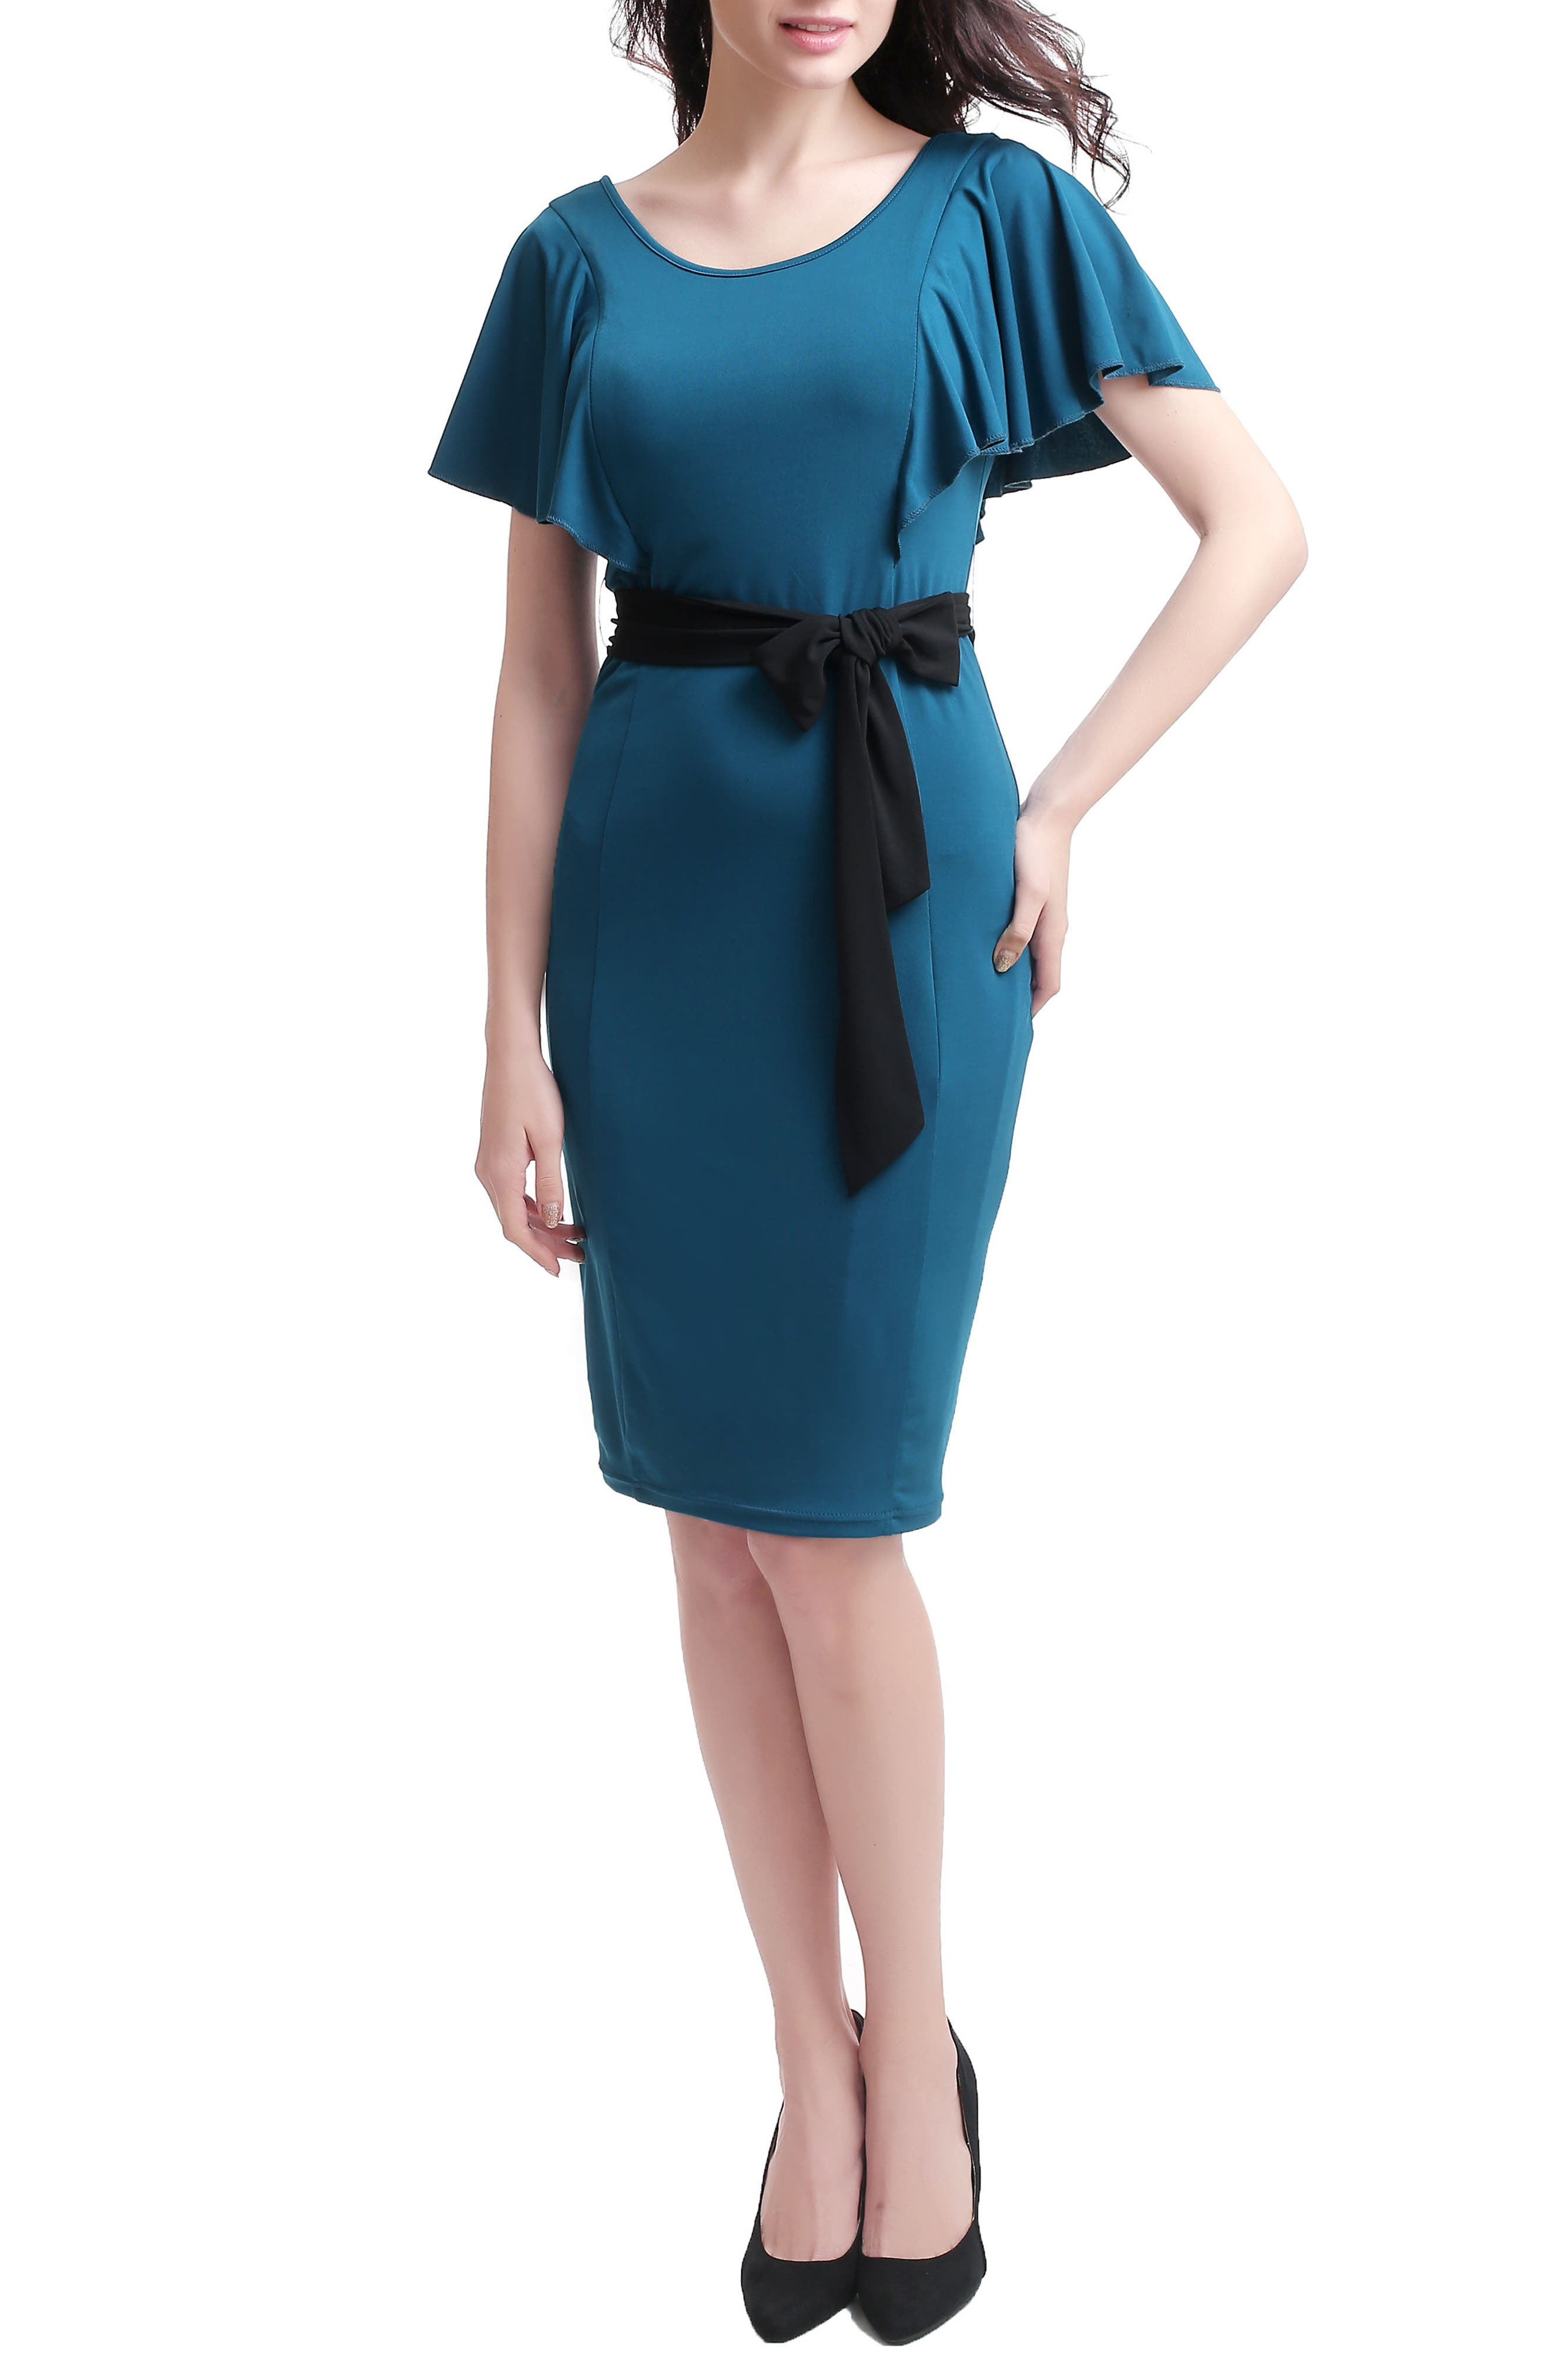 Kimi and Kai Makayla Maternity/Nursing Dress